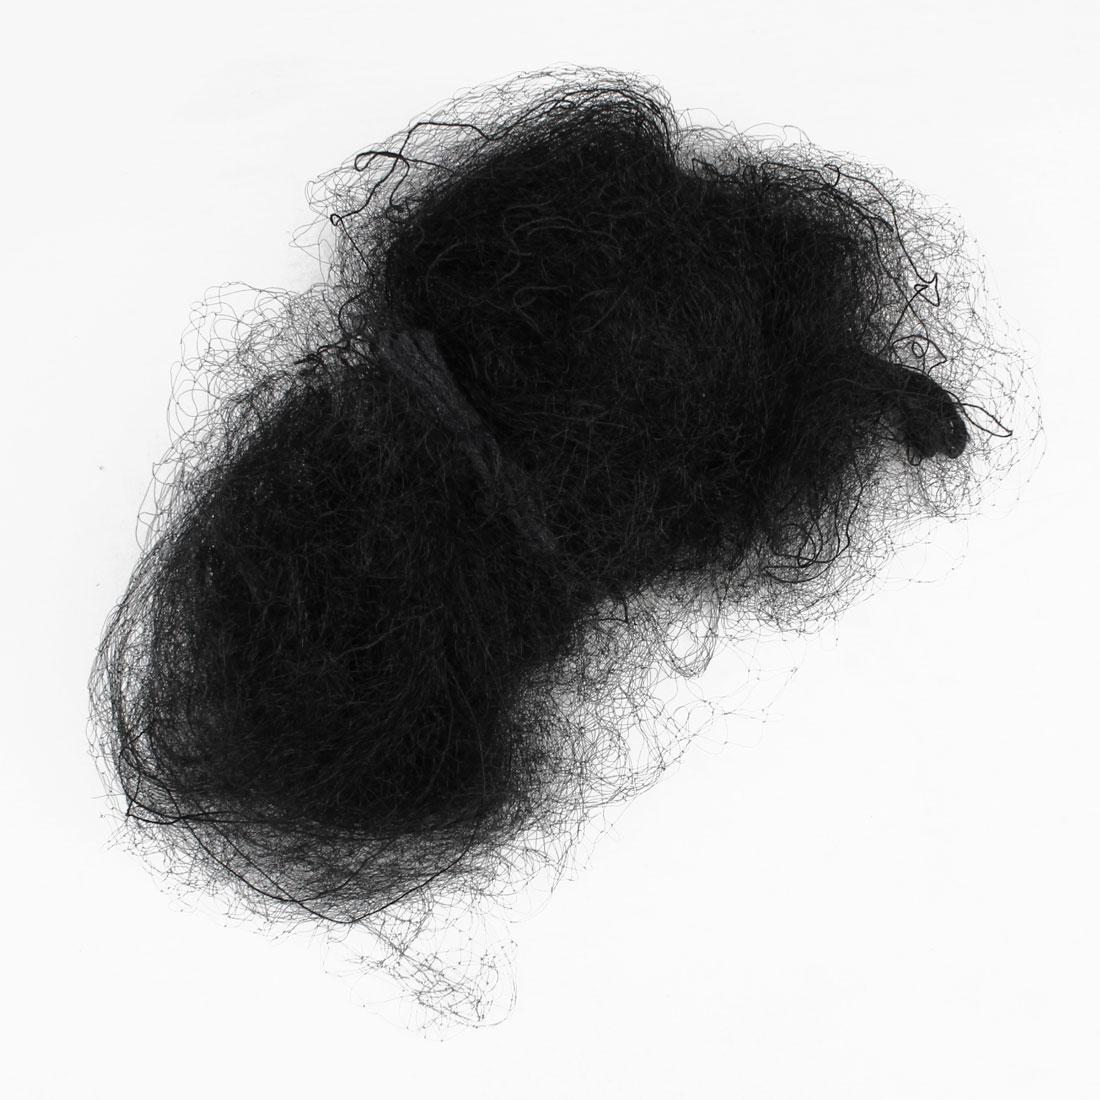 18M x 1.2M 18mm Hole Orchard Garden Anti Bird Netting Nylon Knotted Mist Net